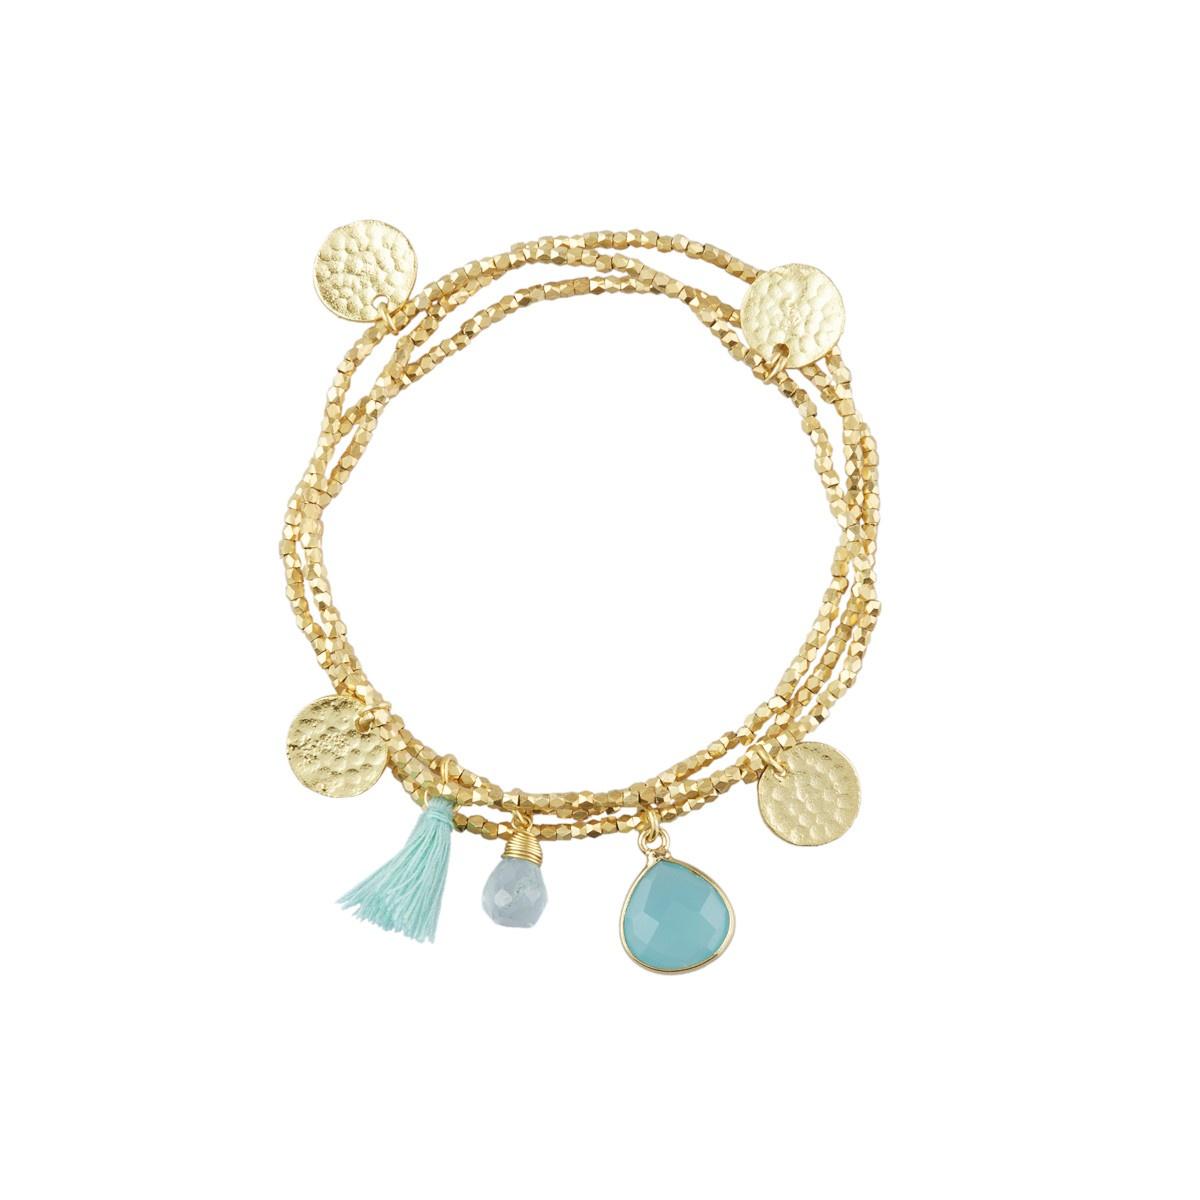 0cf8ca81a184d Gemini Charm Bracelet with Aqua Chalcedony Gemstones by Ashiana London